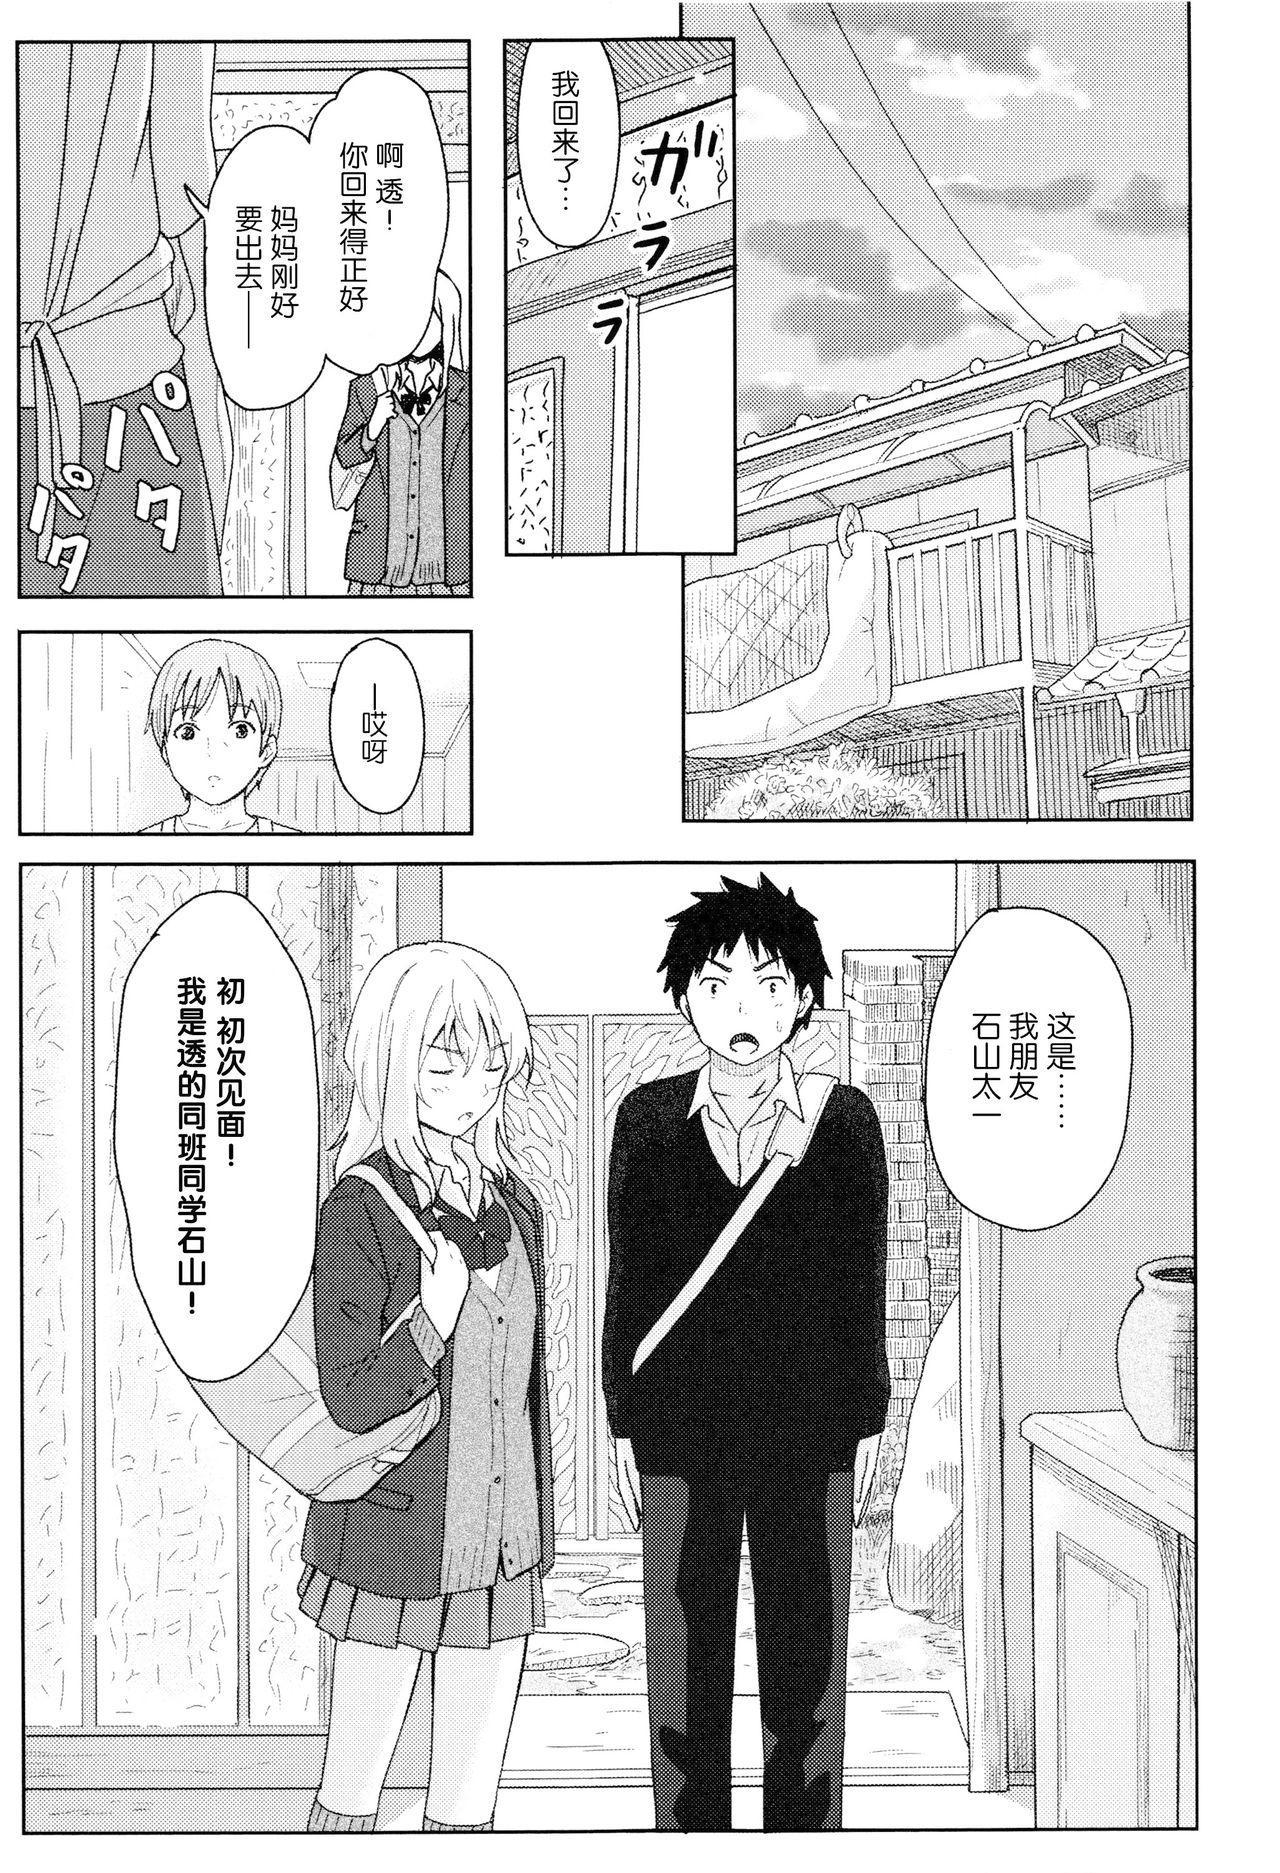 Tokubetsu na Mainichi - Special daily 13